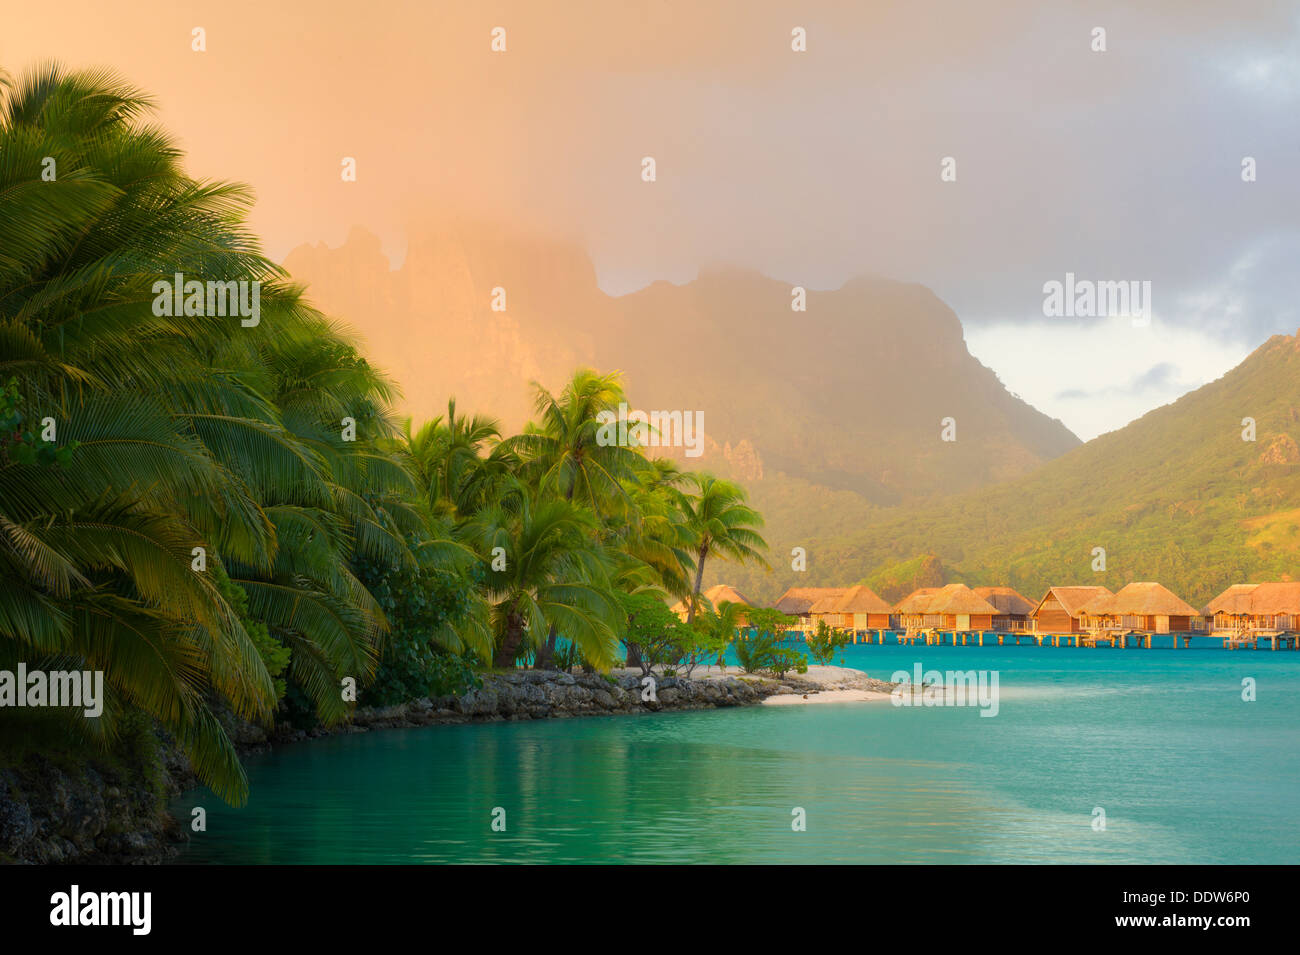 Sunrise and bungalows with lagoon. Bora Bora. French Polynesia. - Stock Image